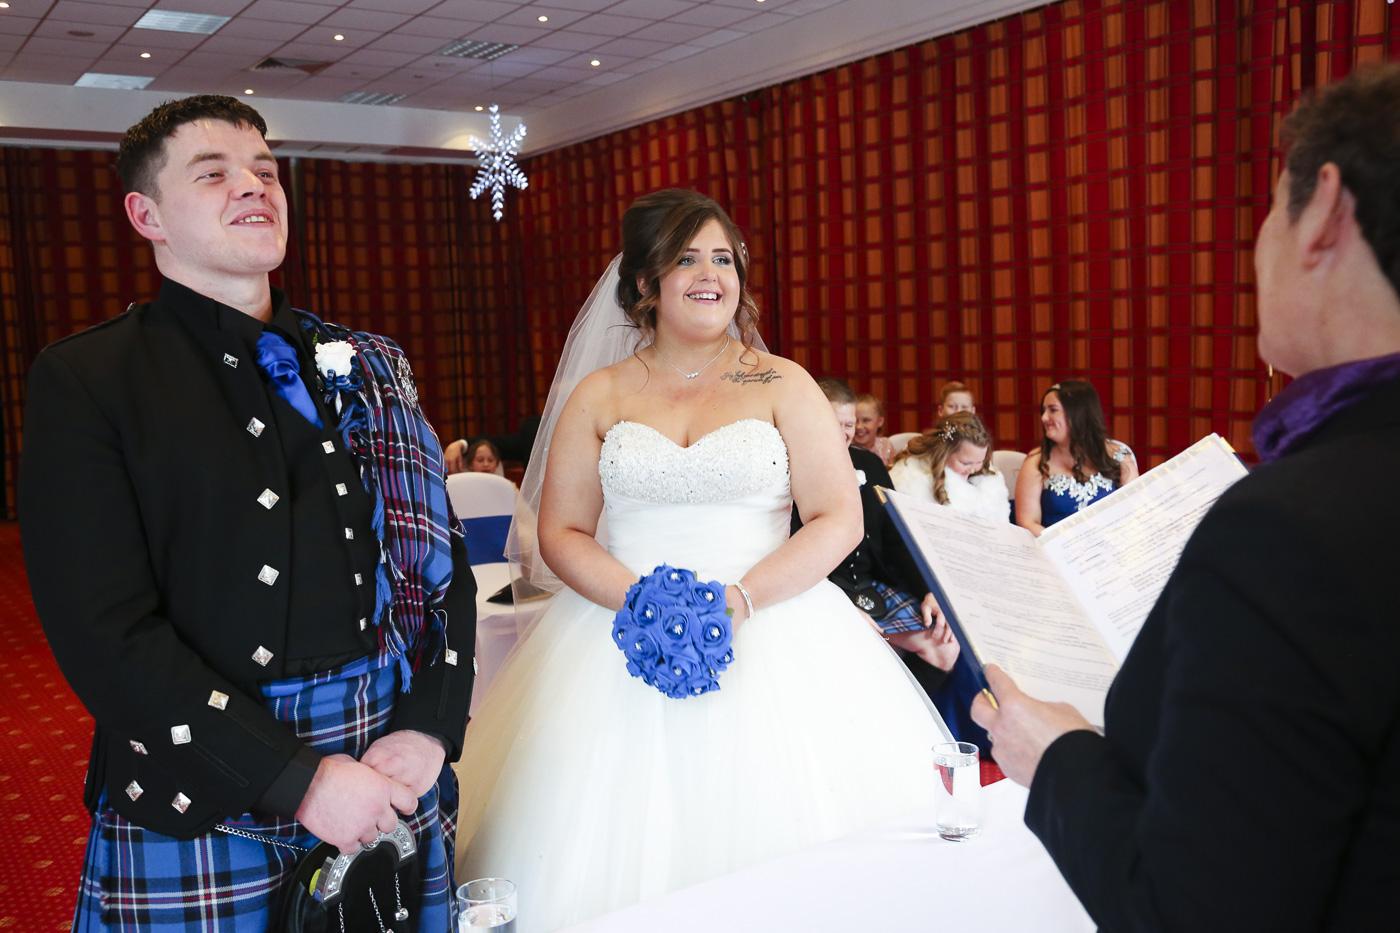 wedding-photography-at-the-hilton-coylumbridge-aviemore-7817